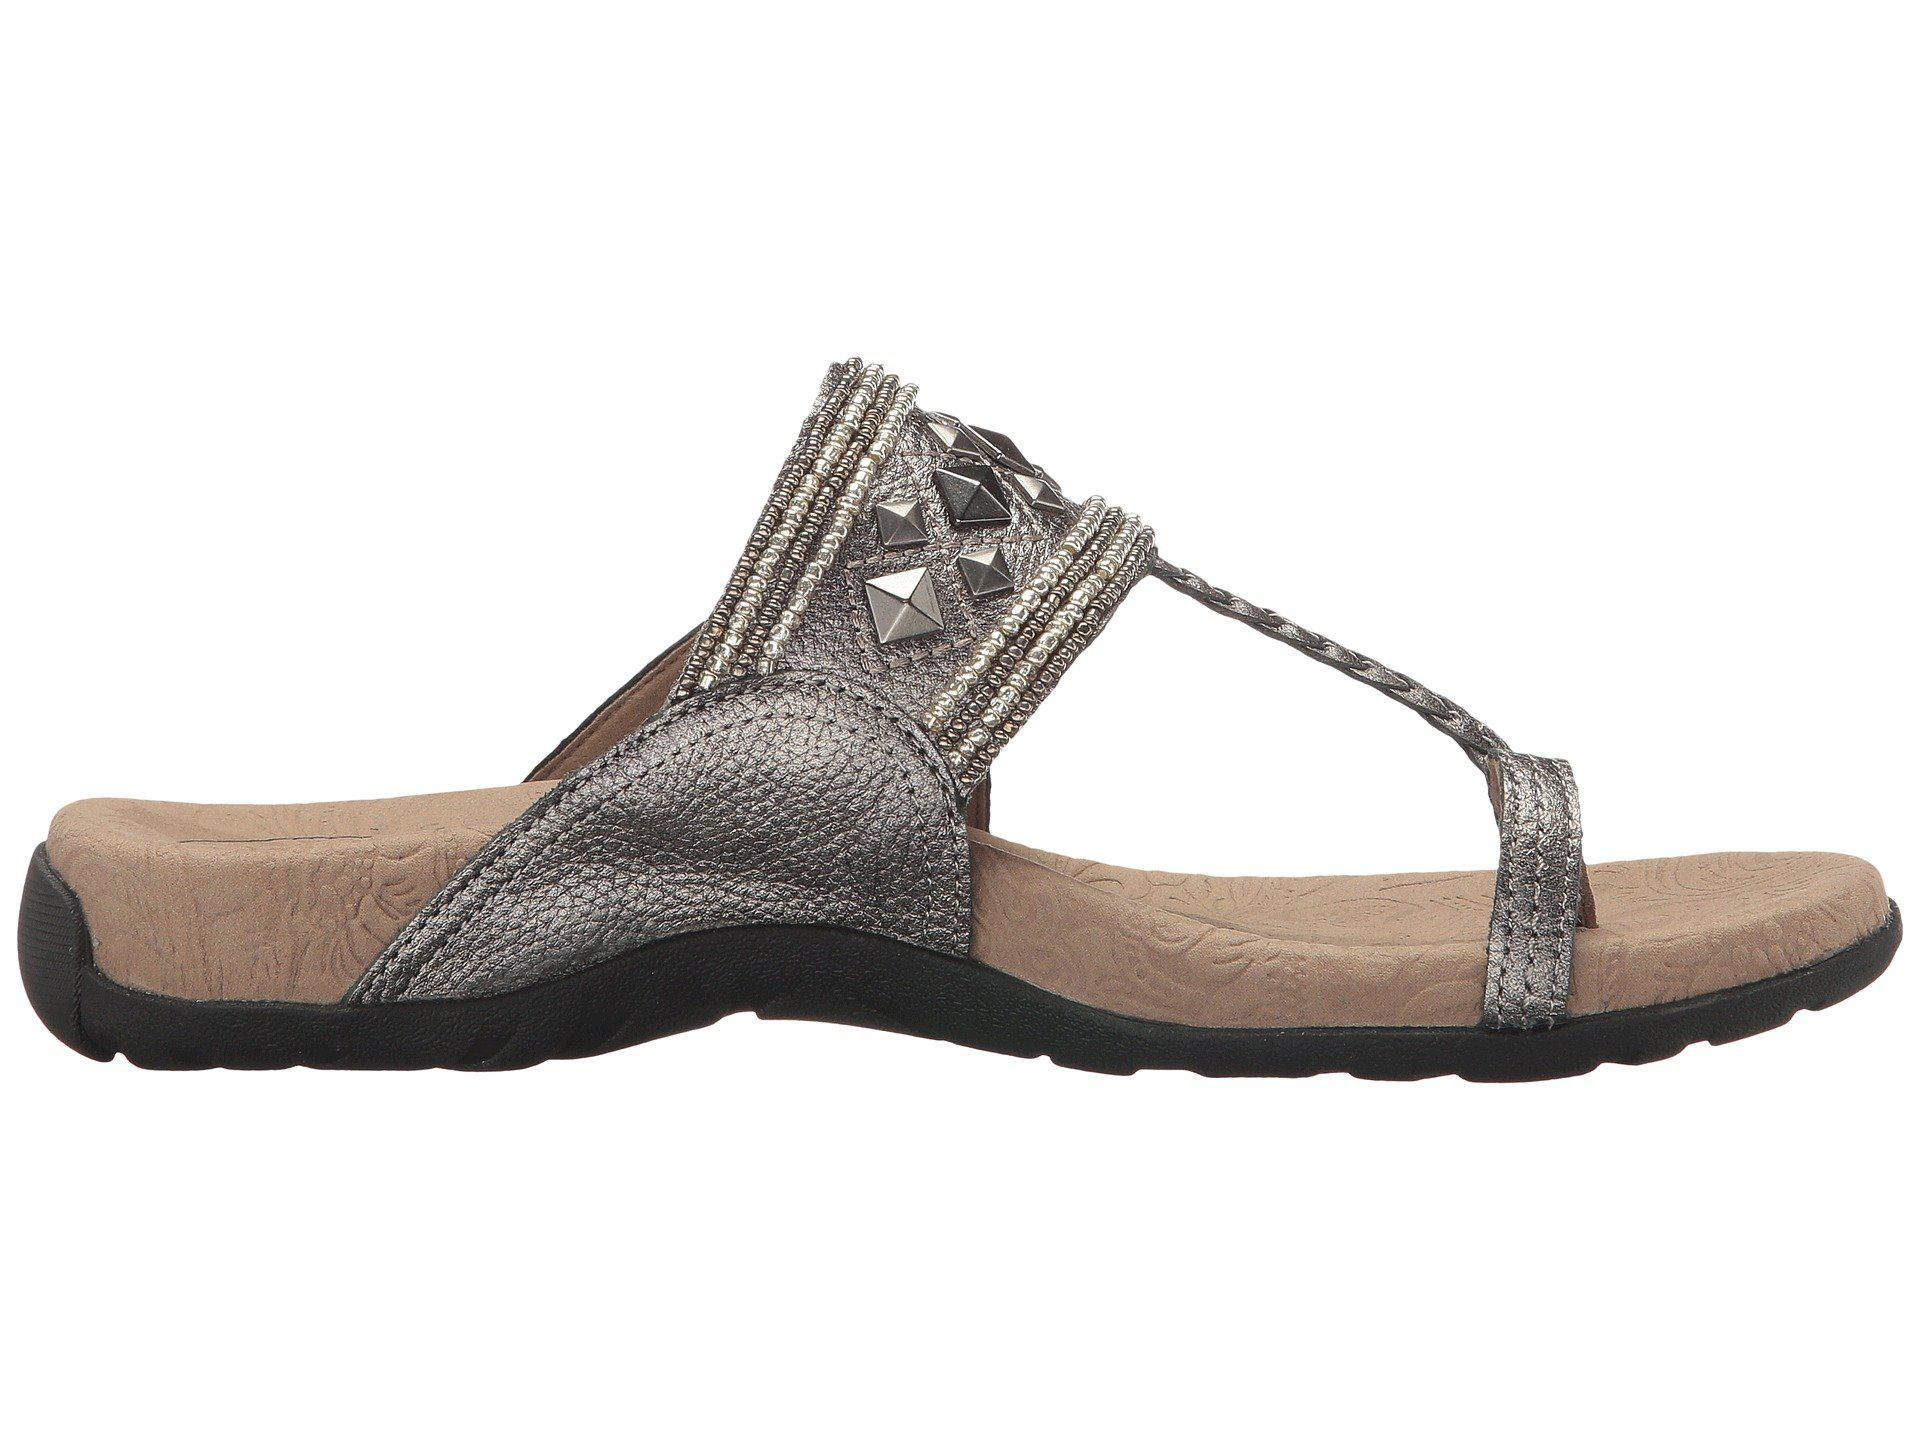 Taos Footwear Genie Lyst